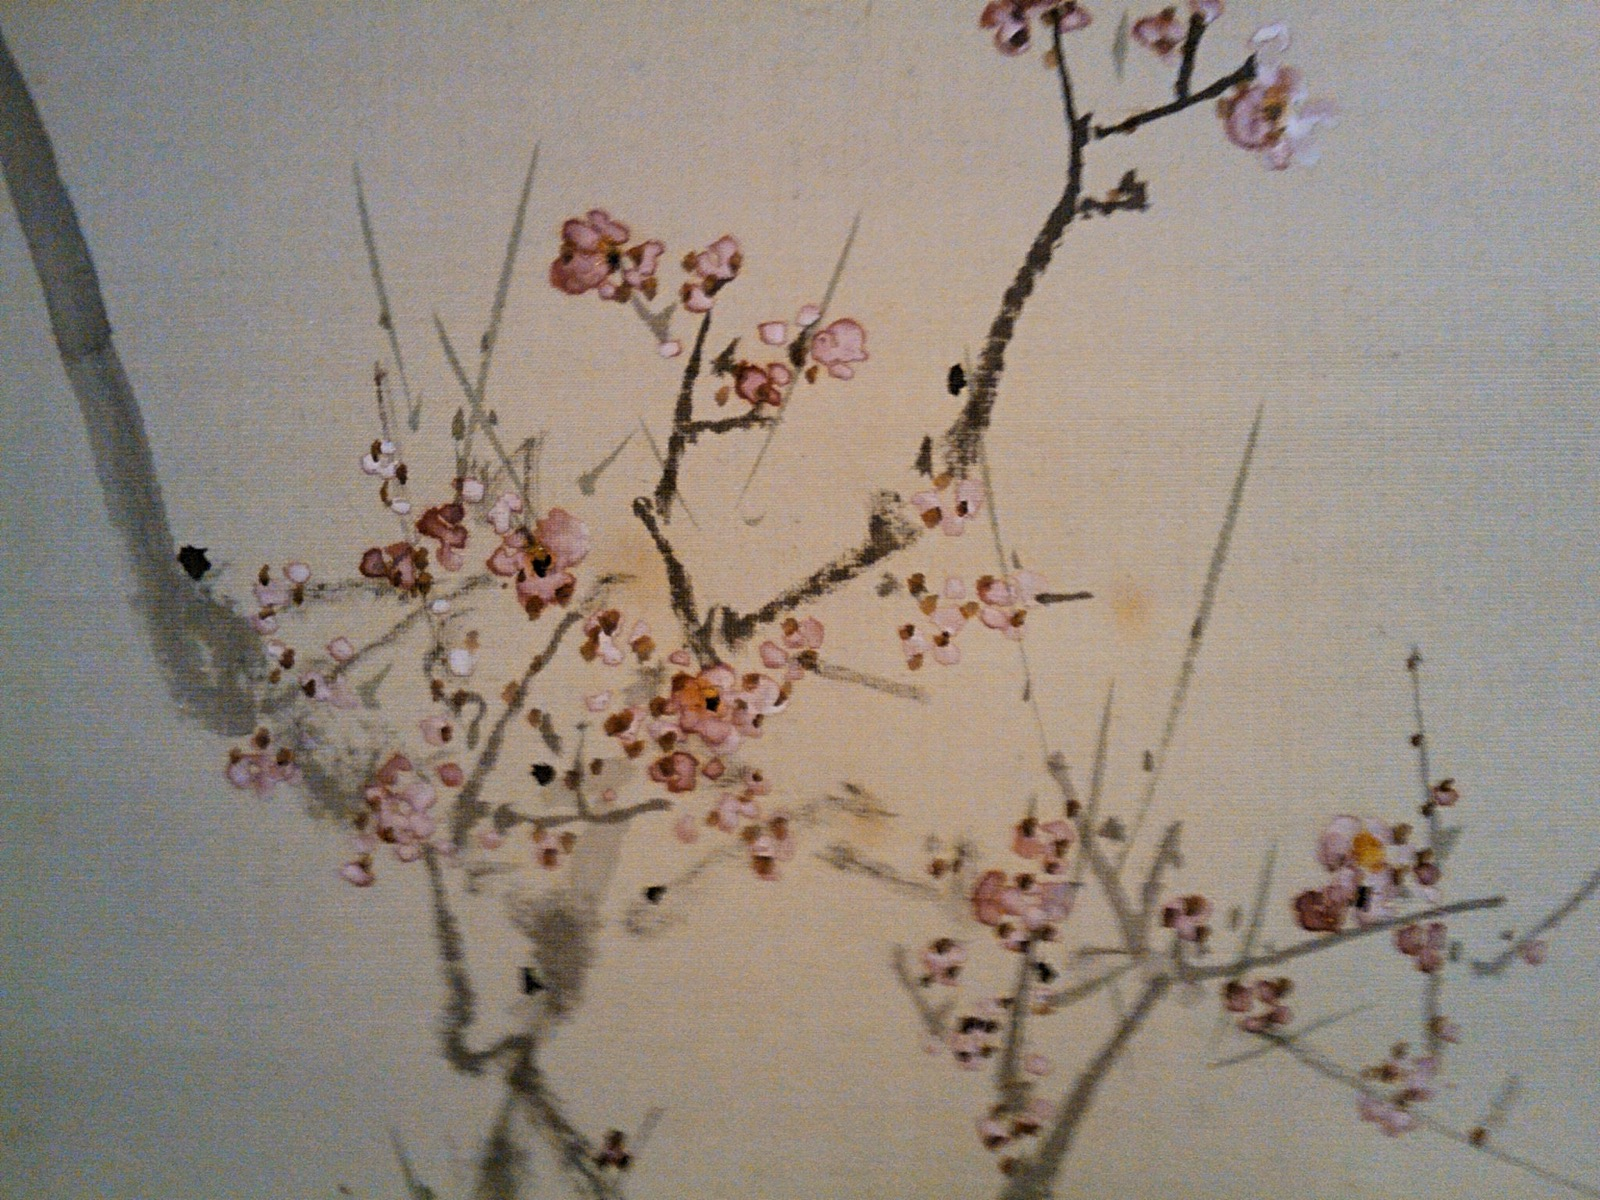 渡辺省亭の画像 p1_14